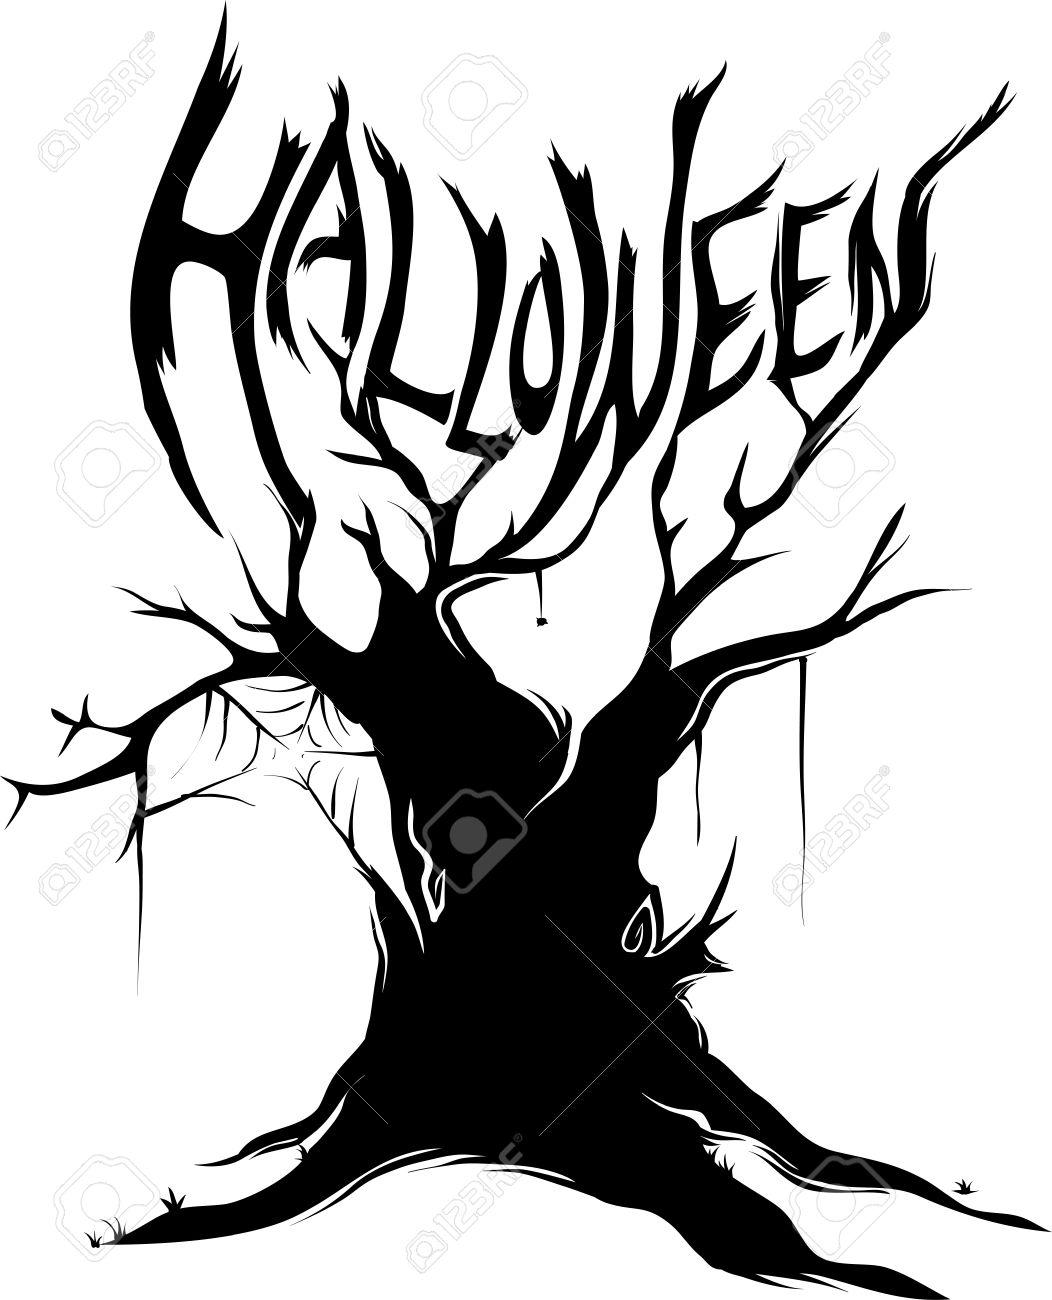 Halloween Tree Silhouette Clipart